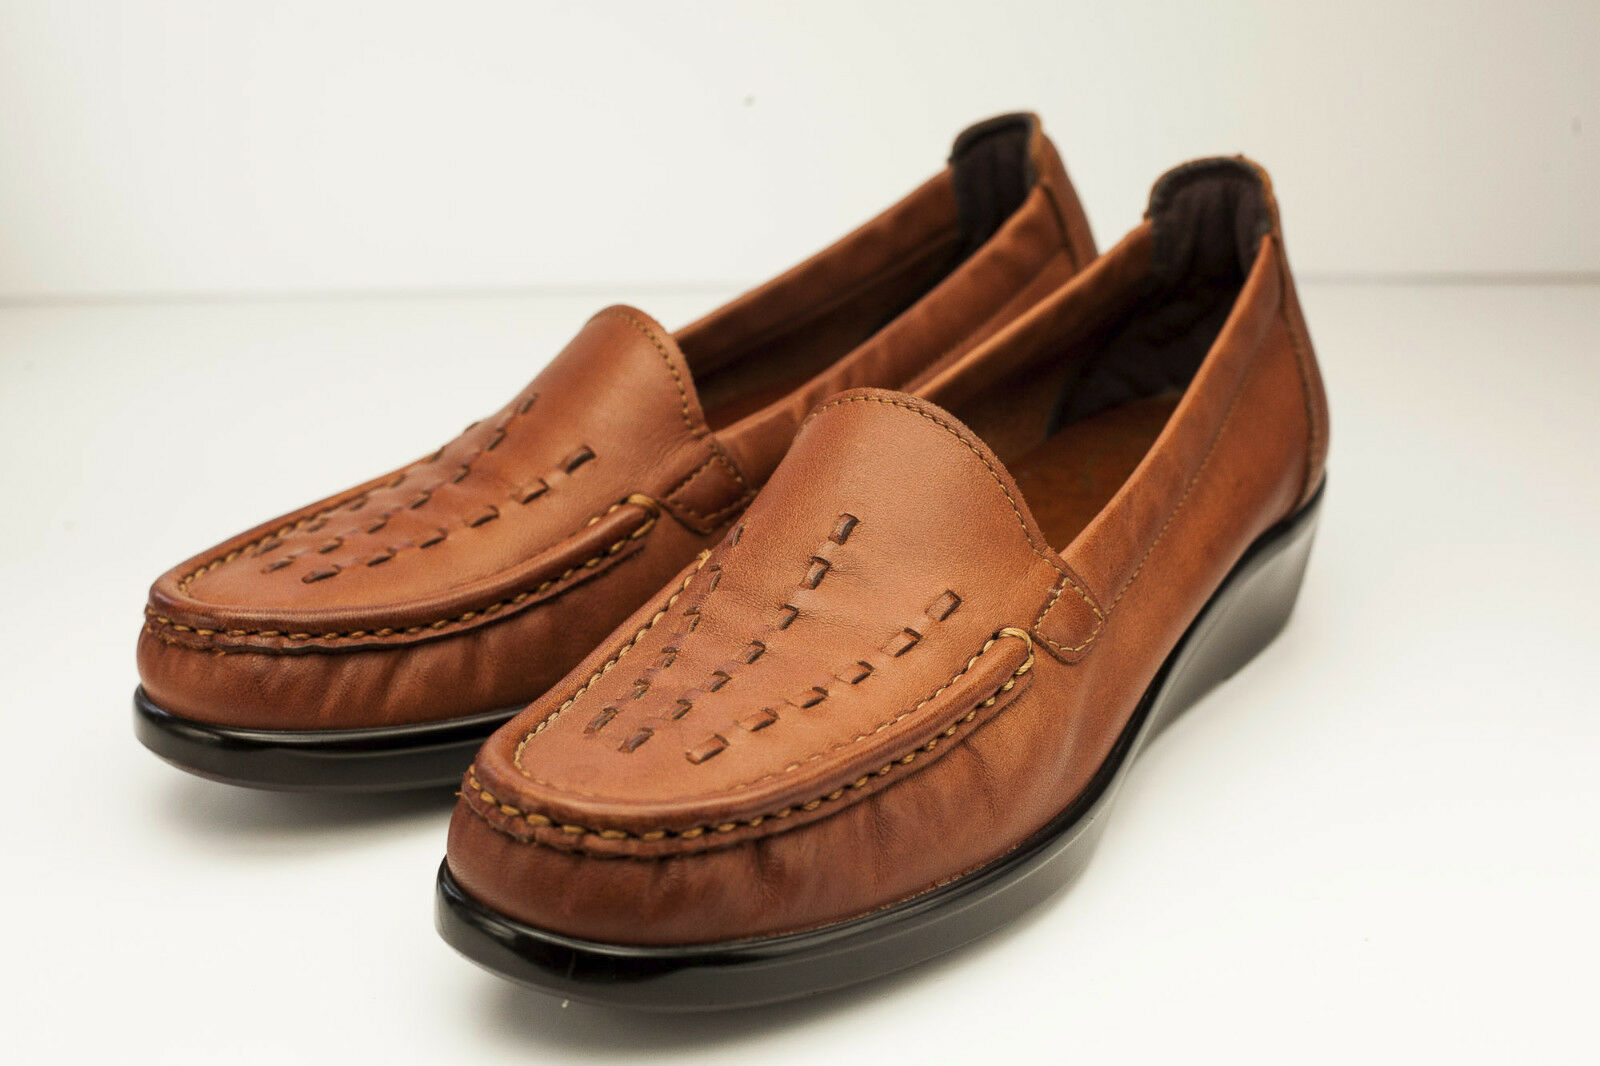 SAS Weave 7.5 Slim Brown Chesnut Loafers Women's Slip-On shoes